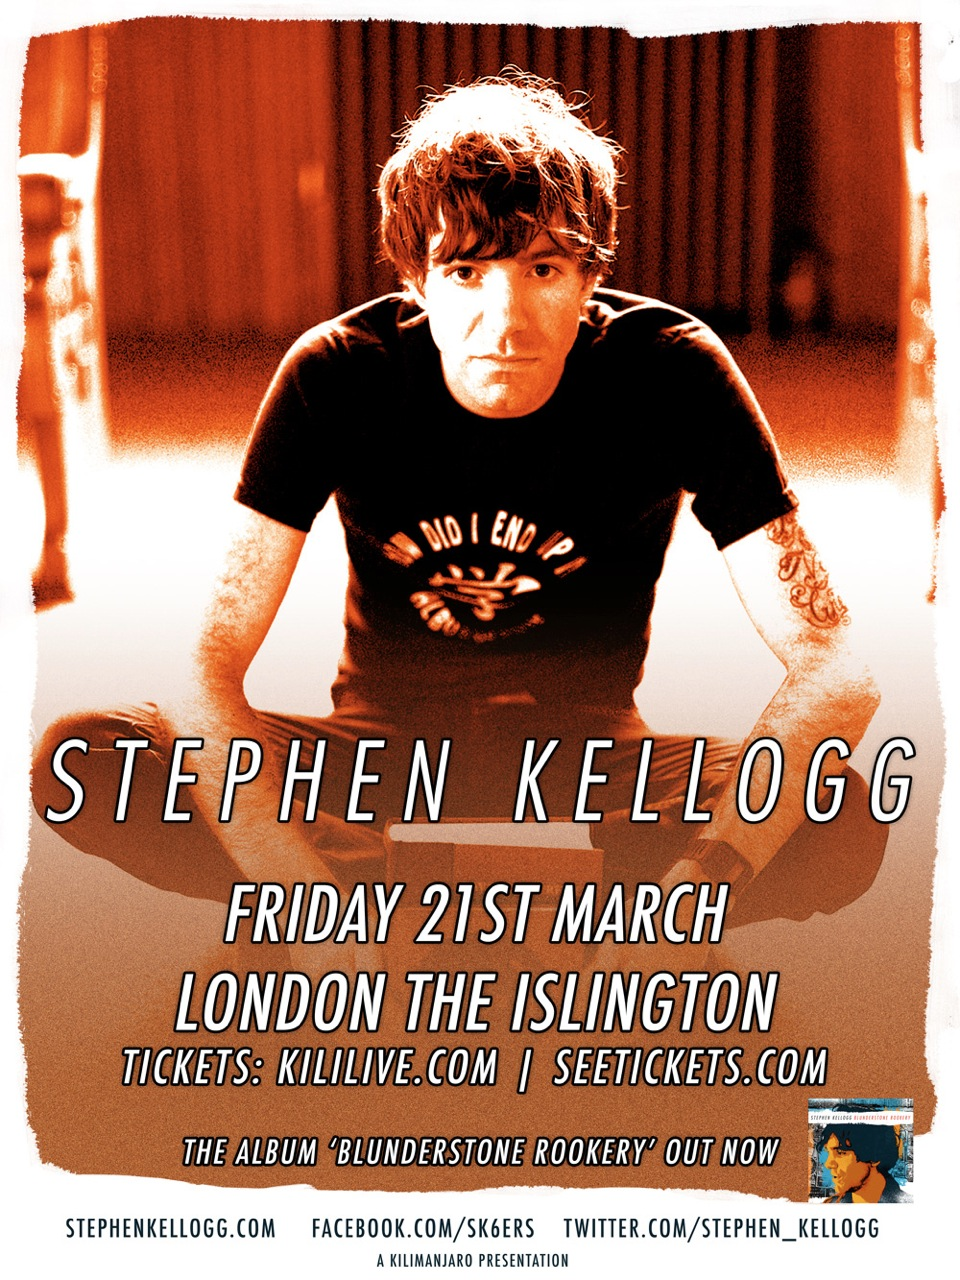 SK_London2014